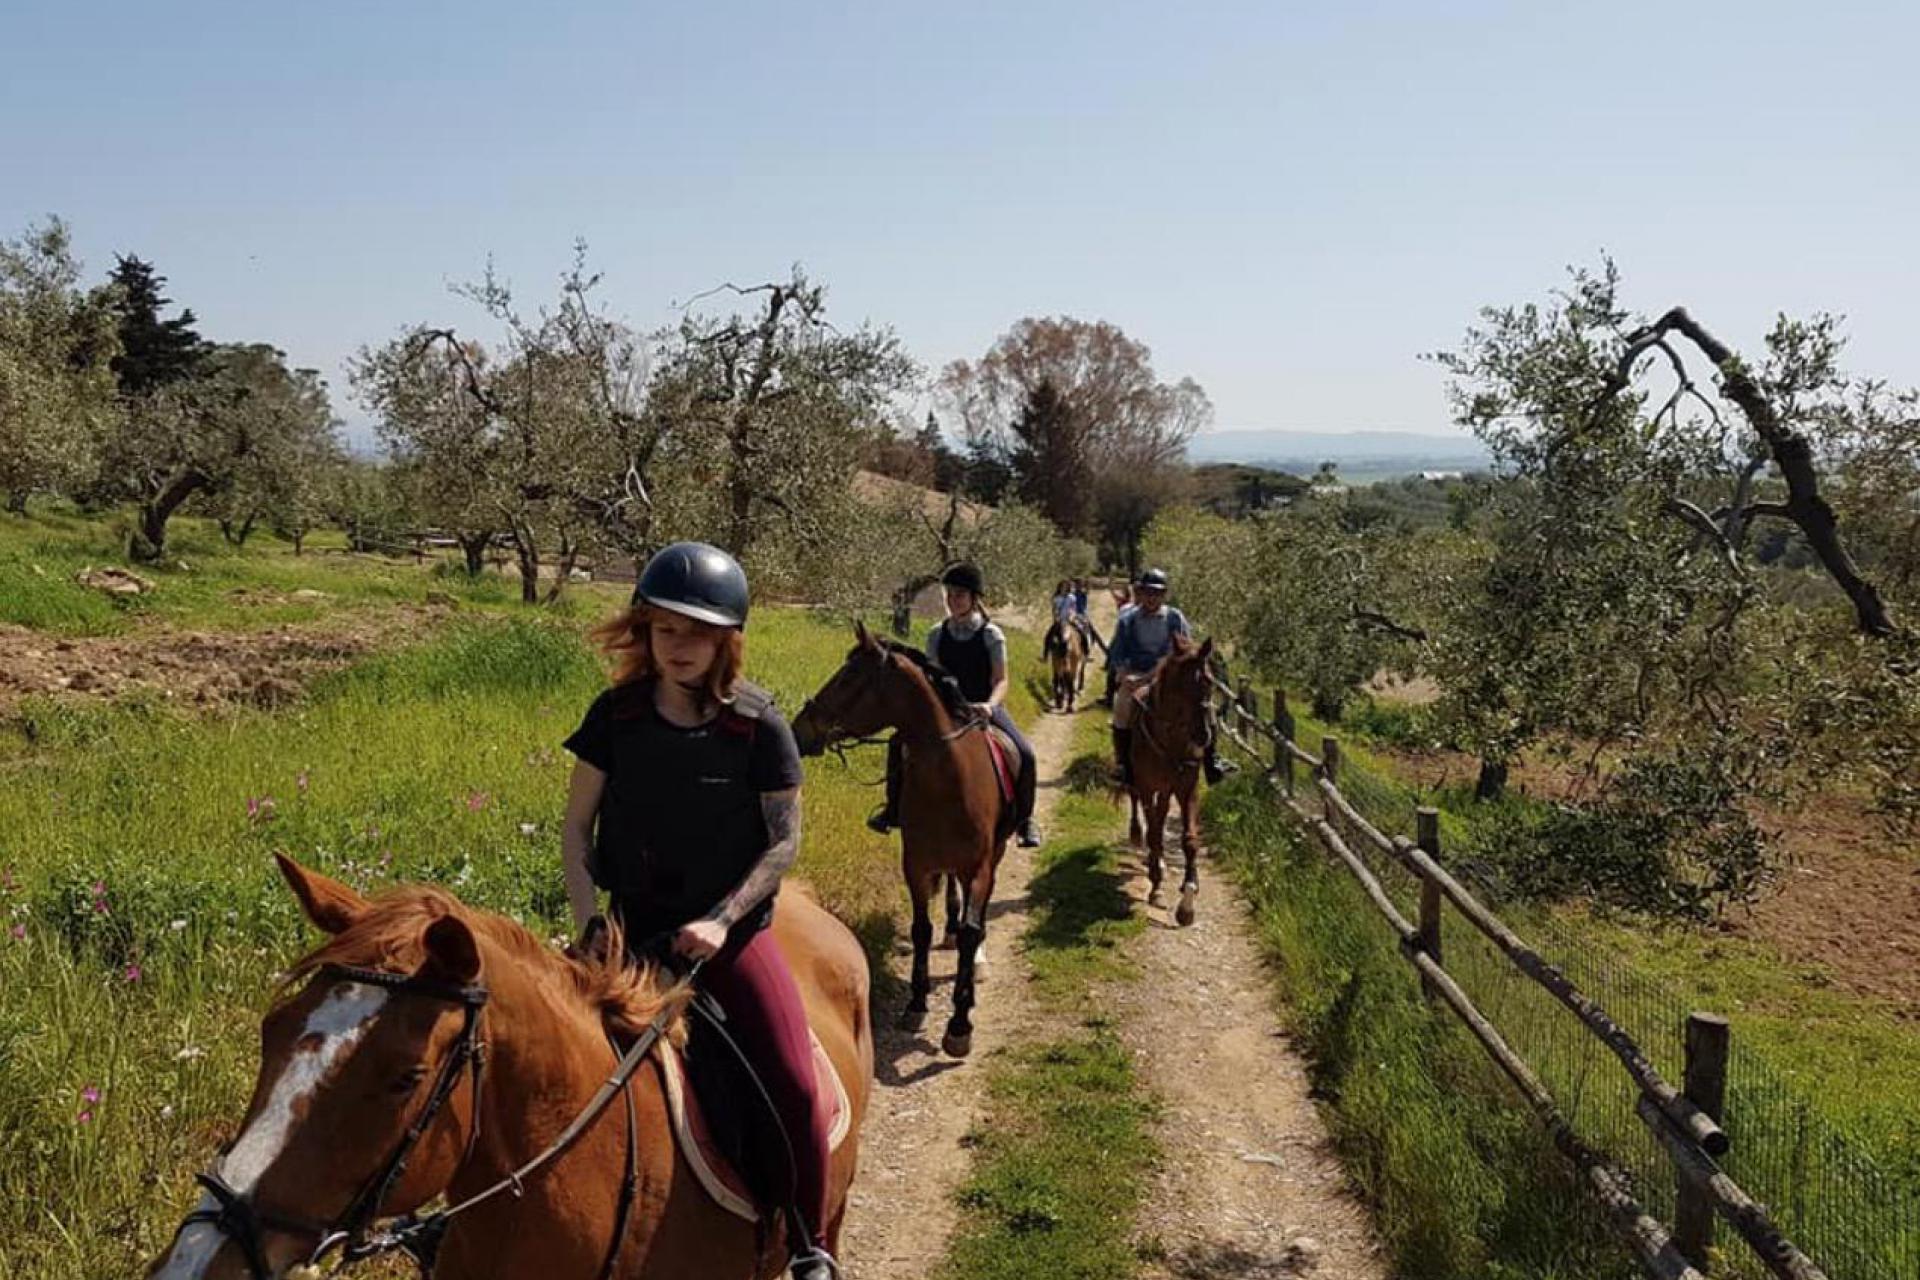 Agriturismo Toskana Urlaub an der toskanischen Küste   myitalyselection.de